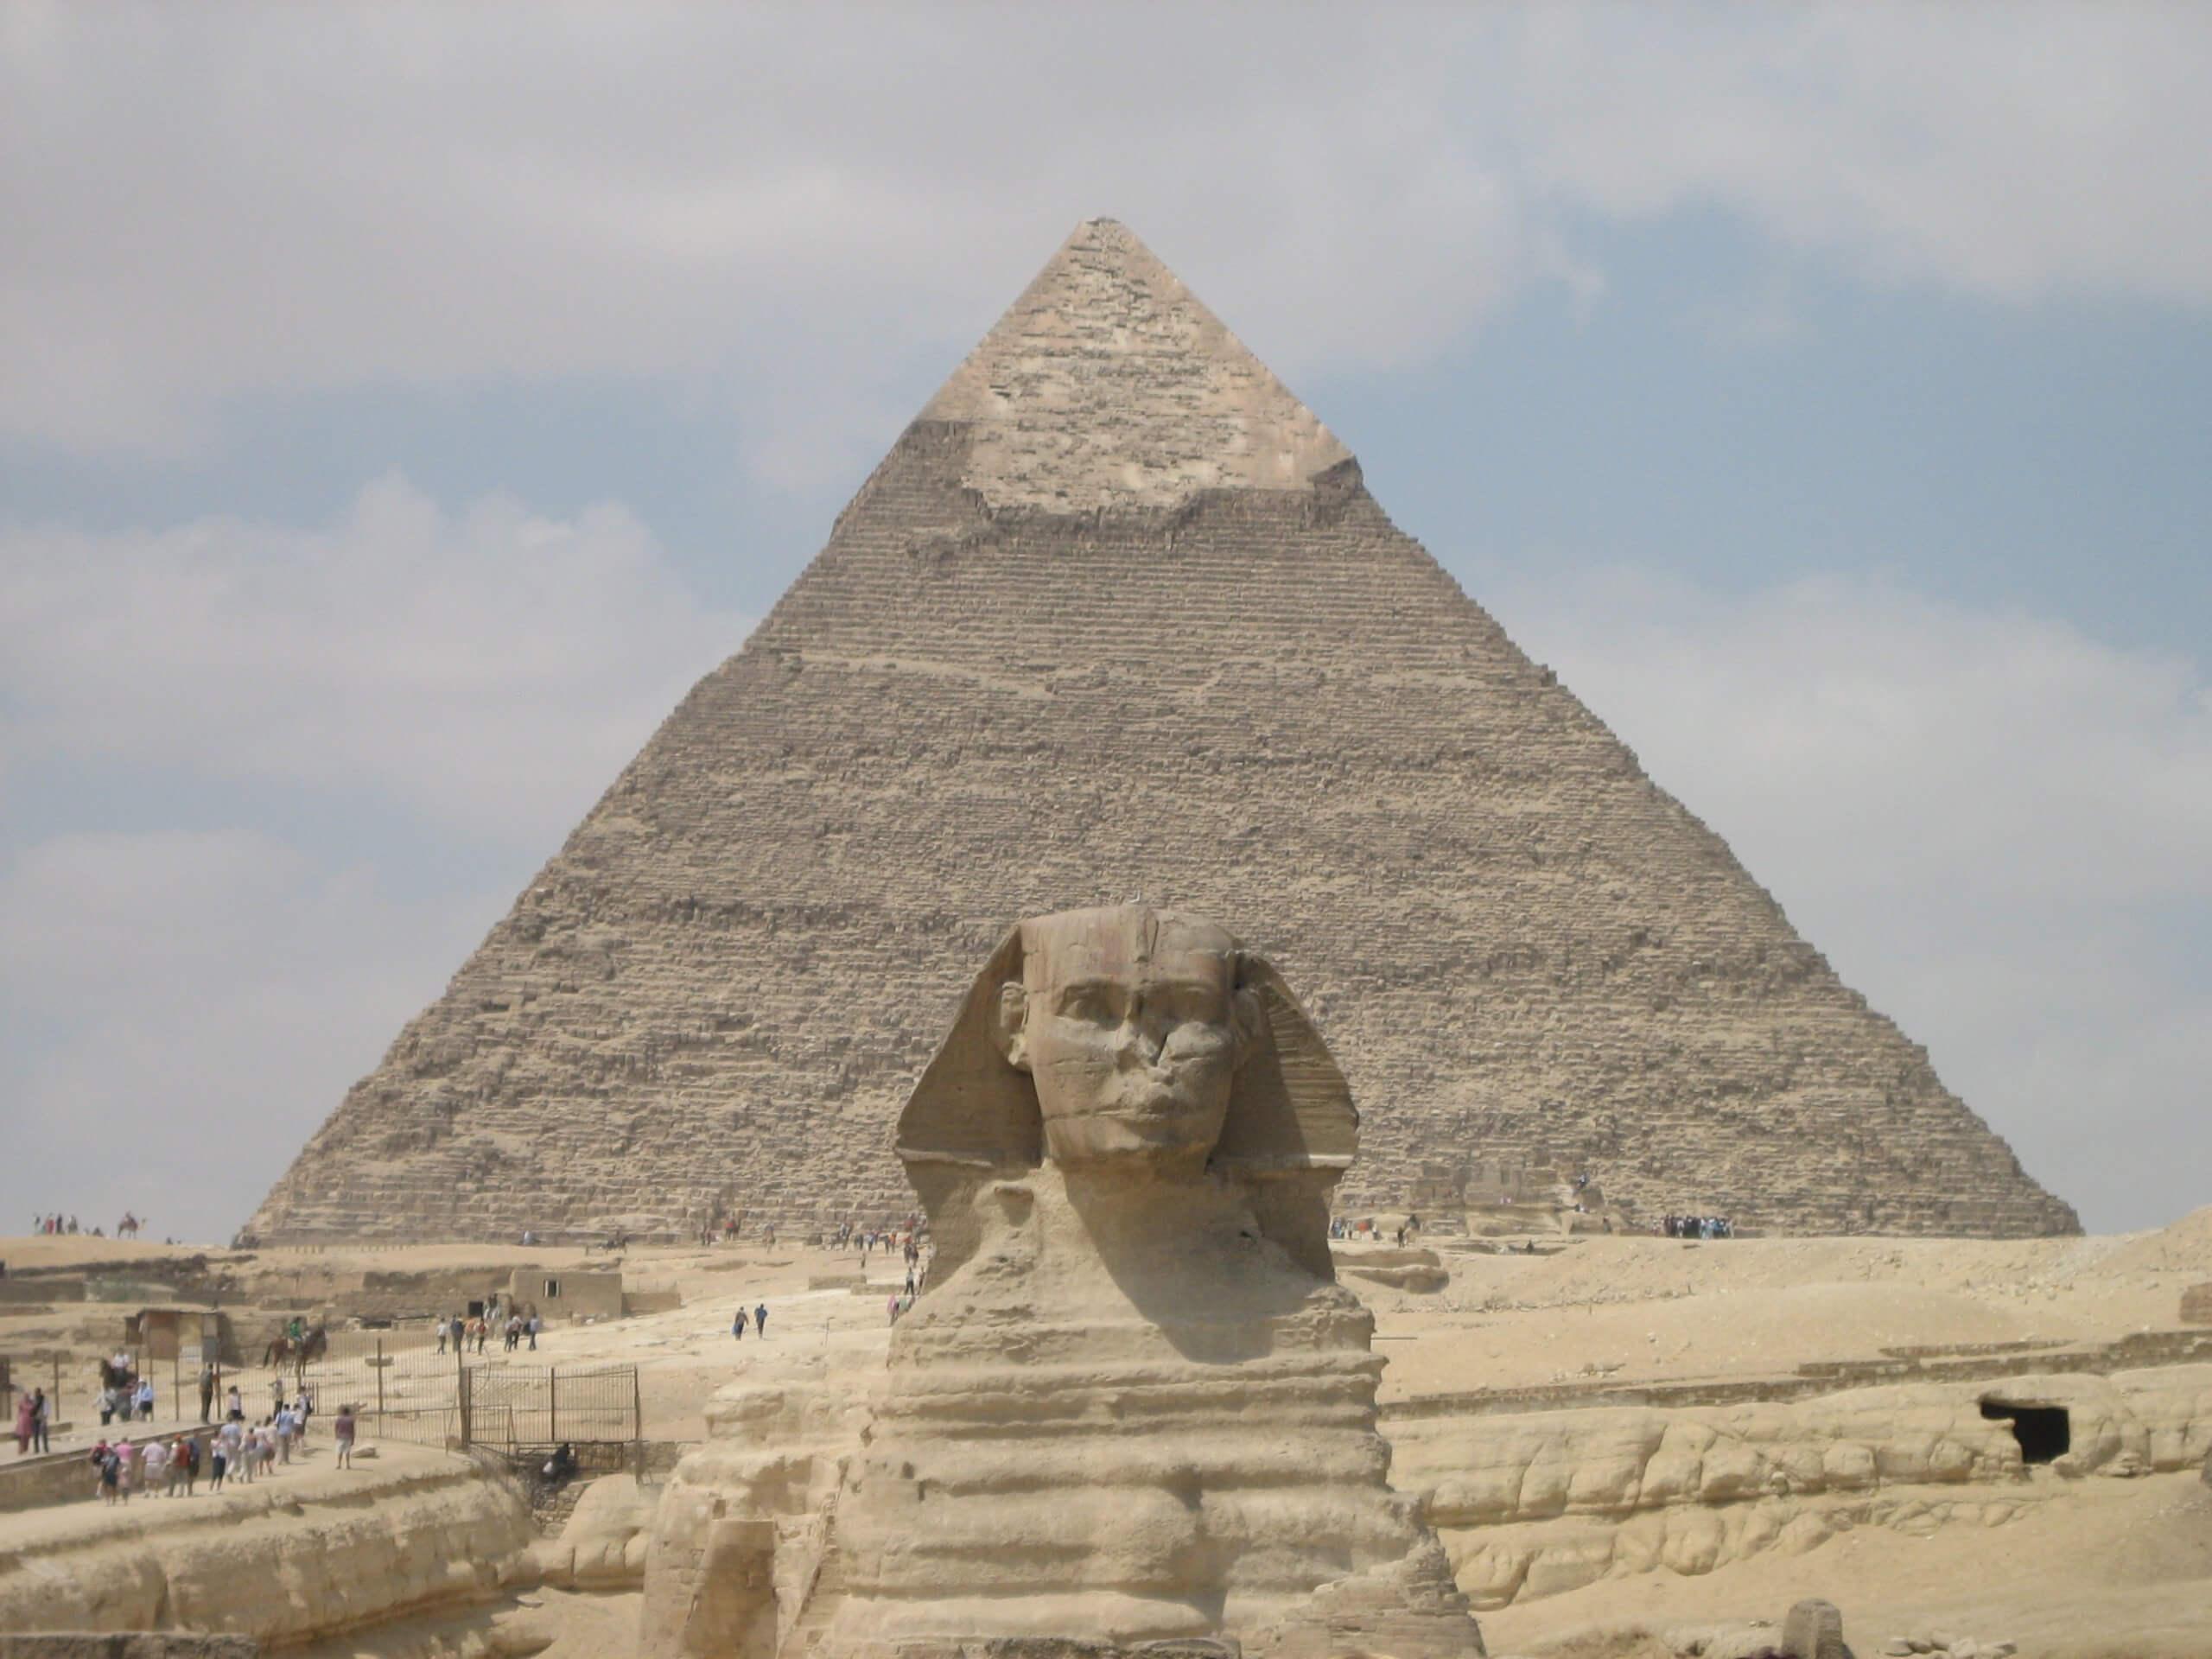 L'autre nom de la Pyramide de Kheops est la « Grande Pyramide de Gizeh ».